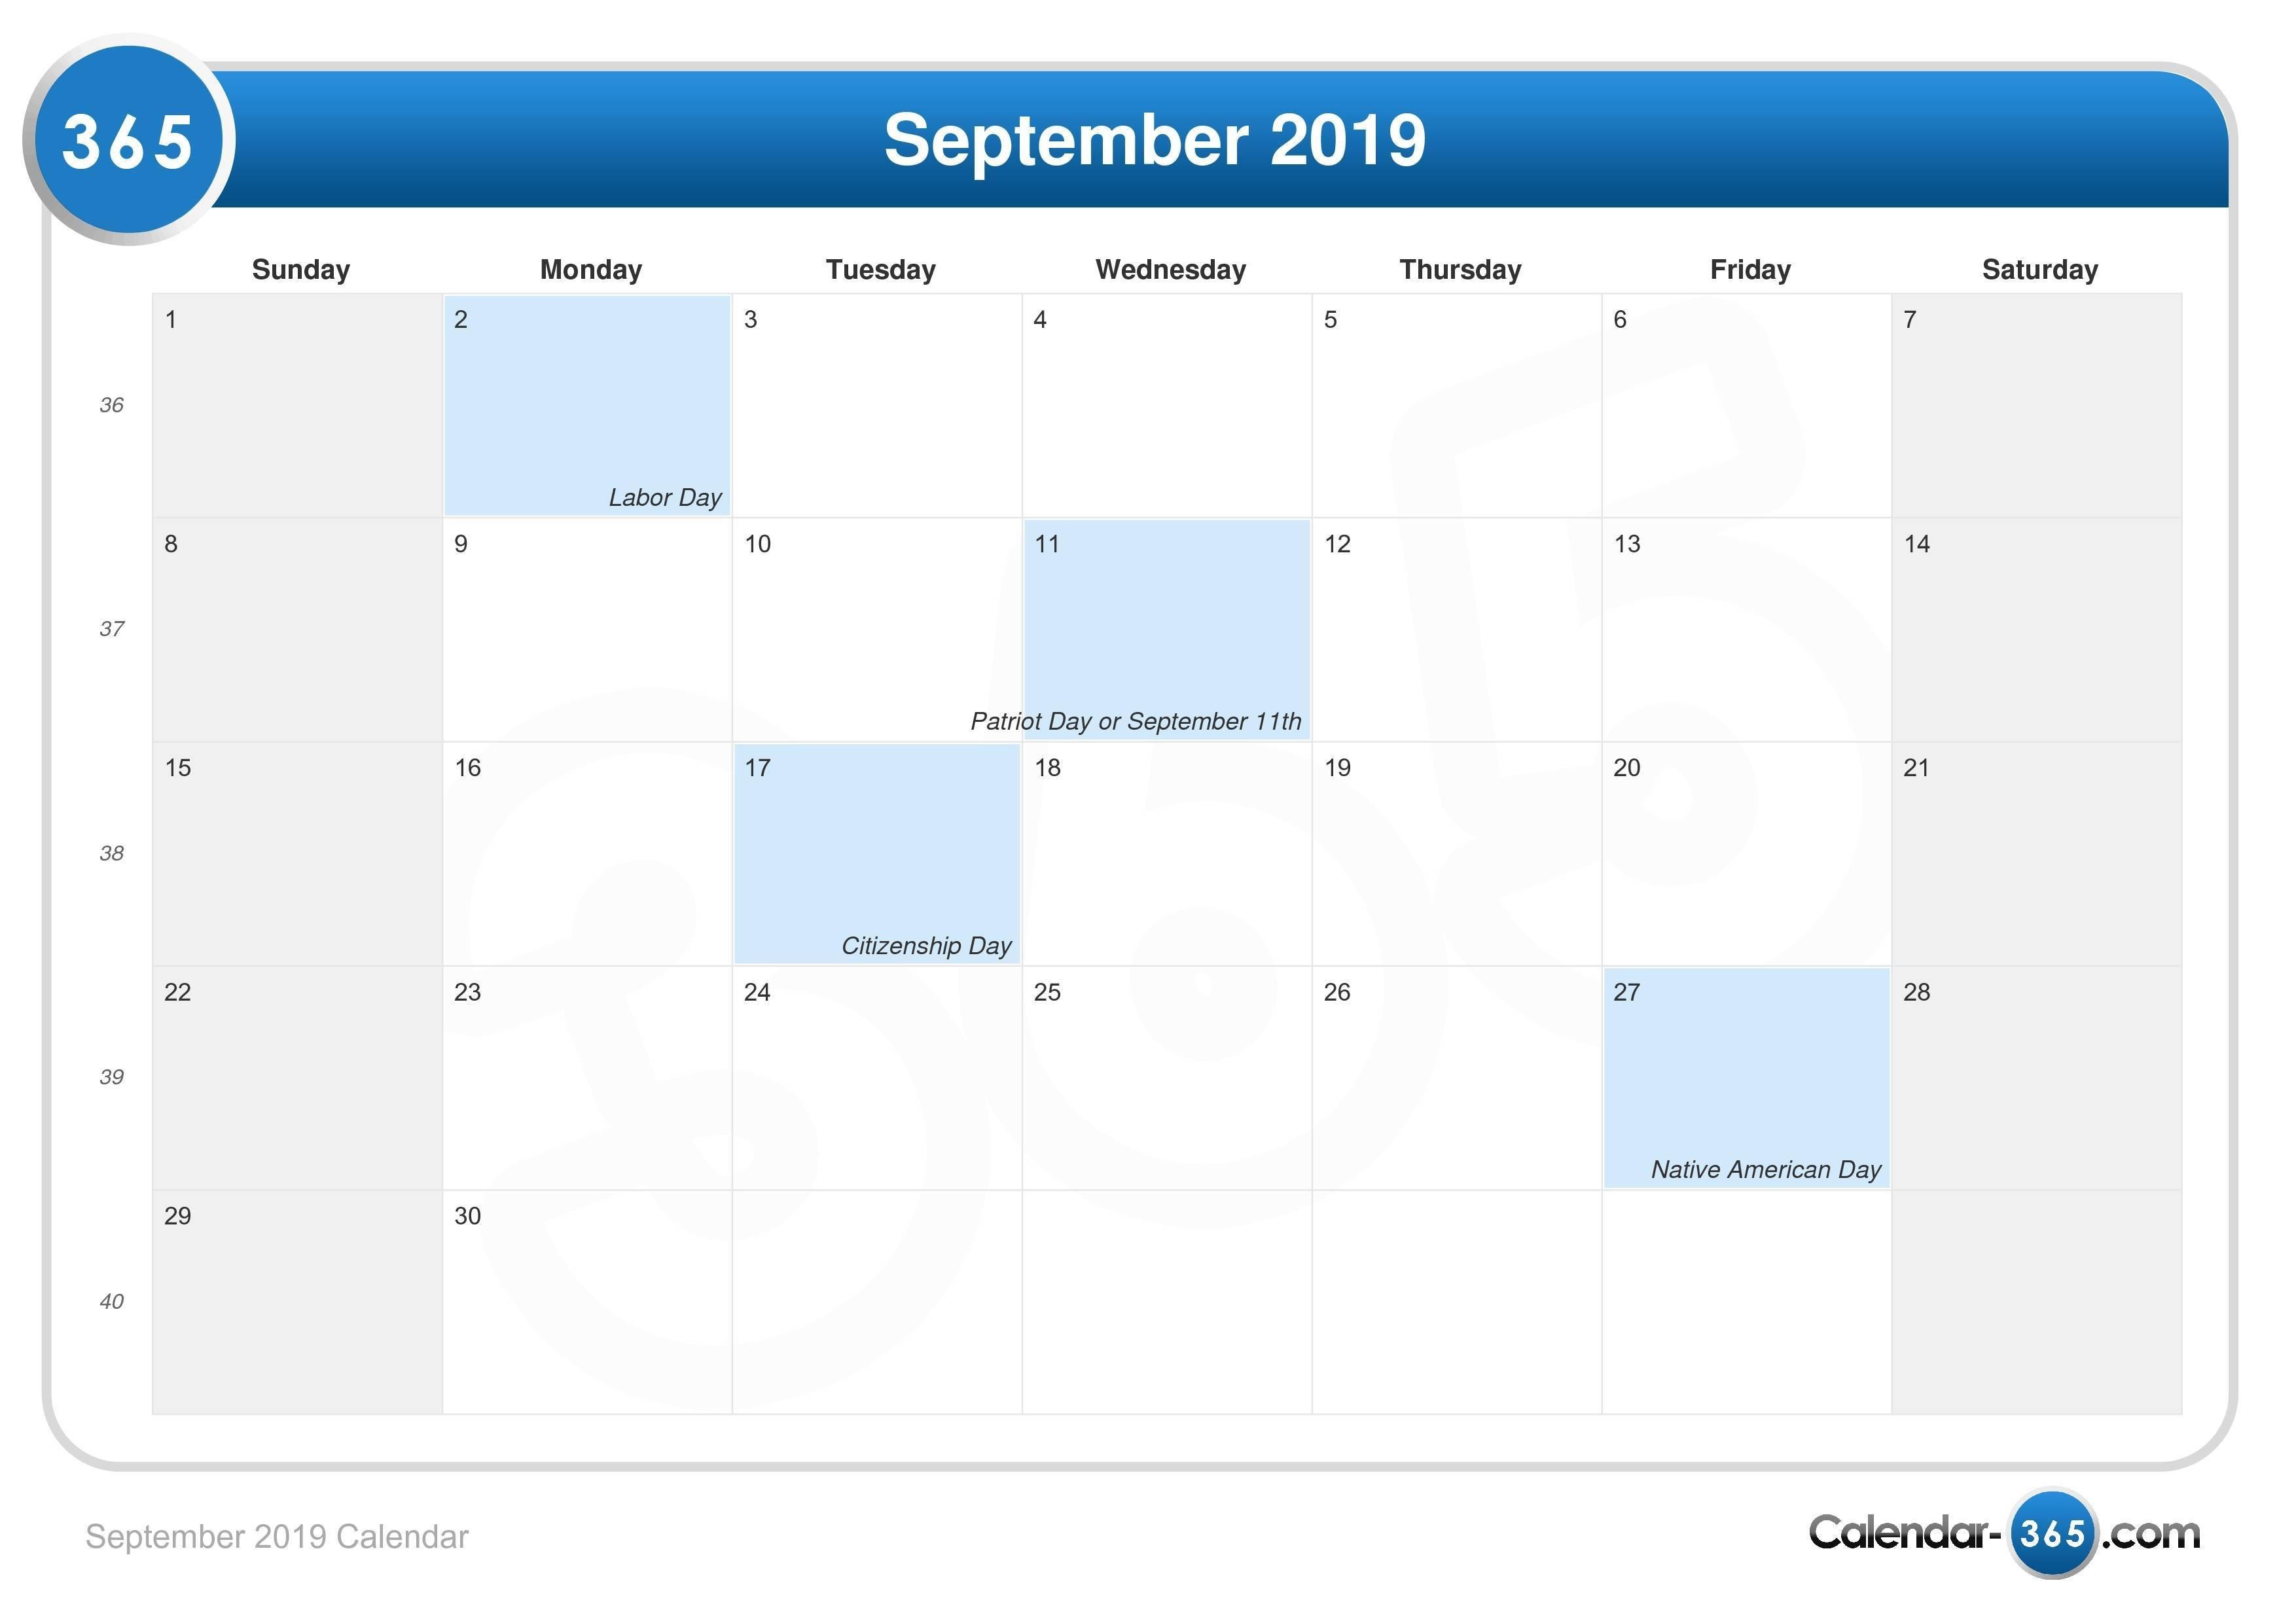 September 2019 Calendar Calendar 2019 Labor Day